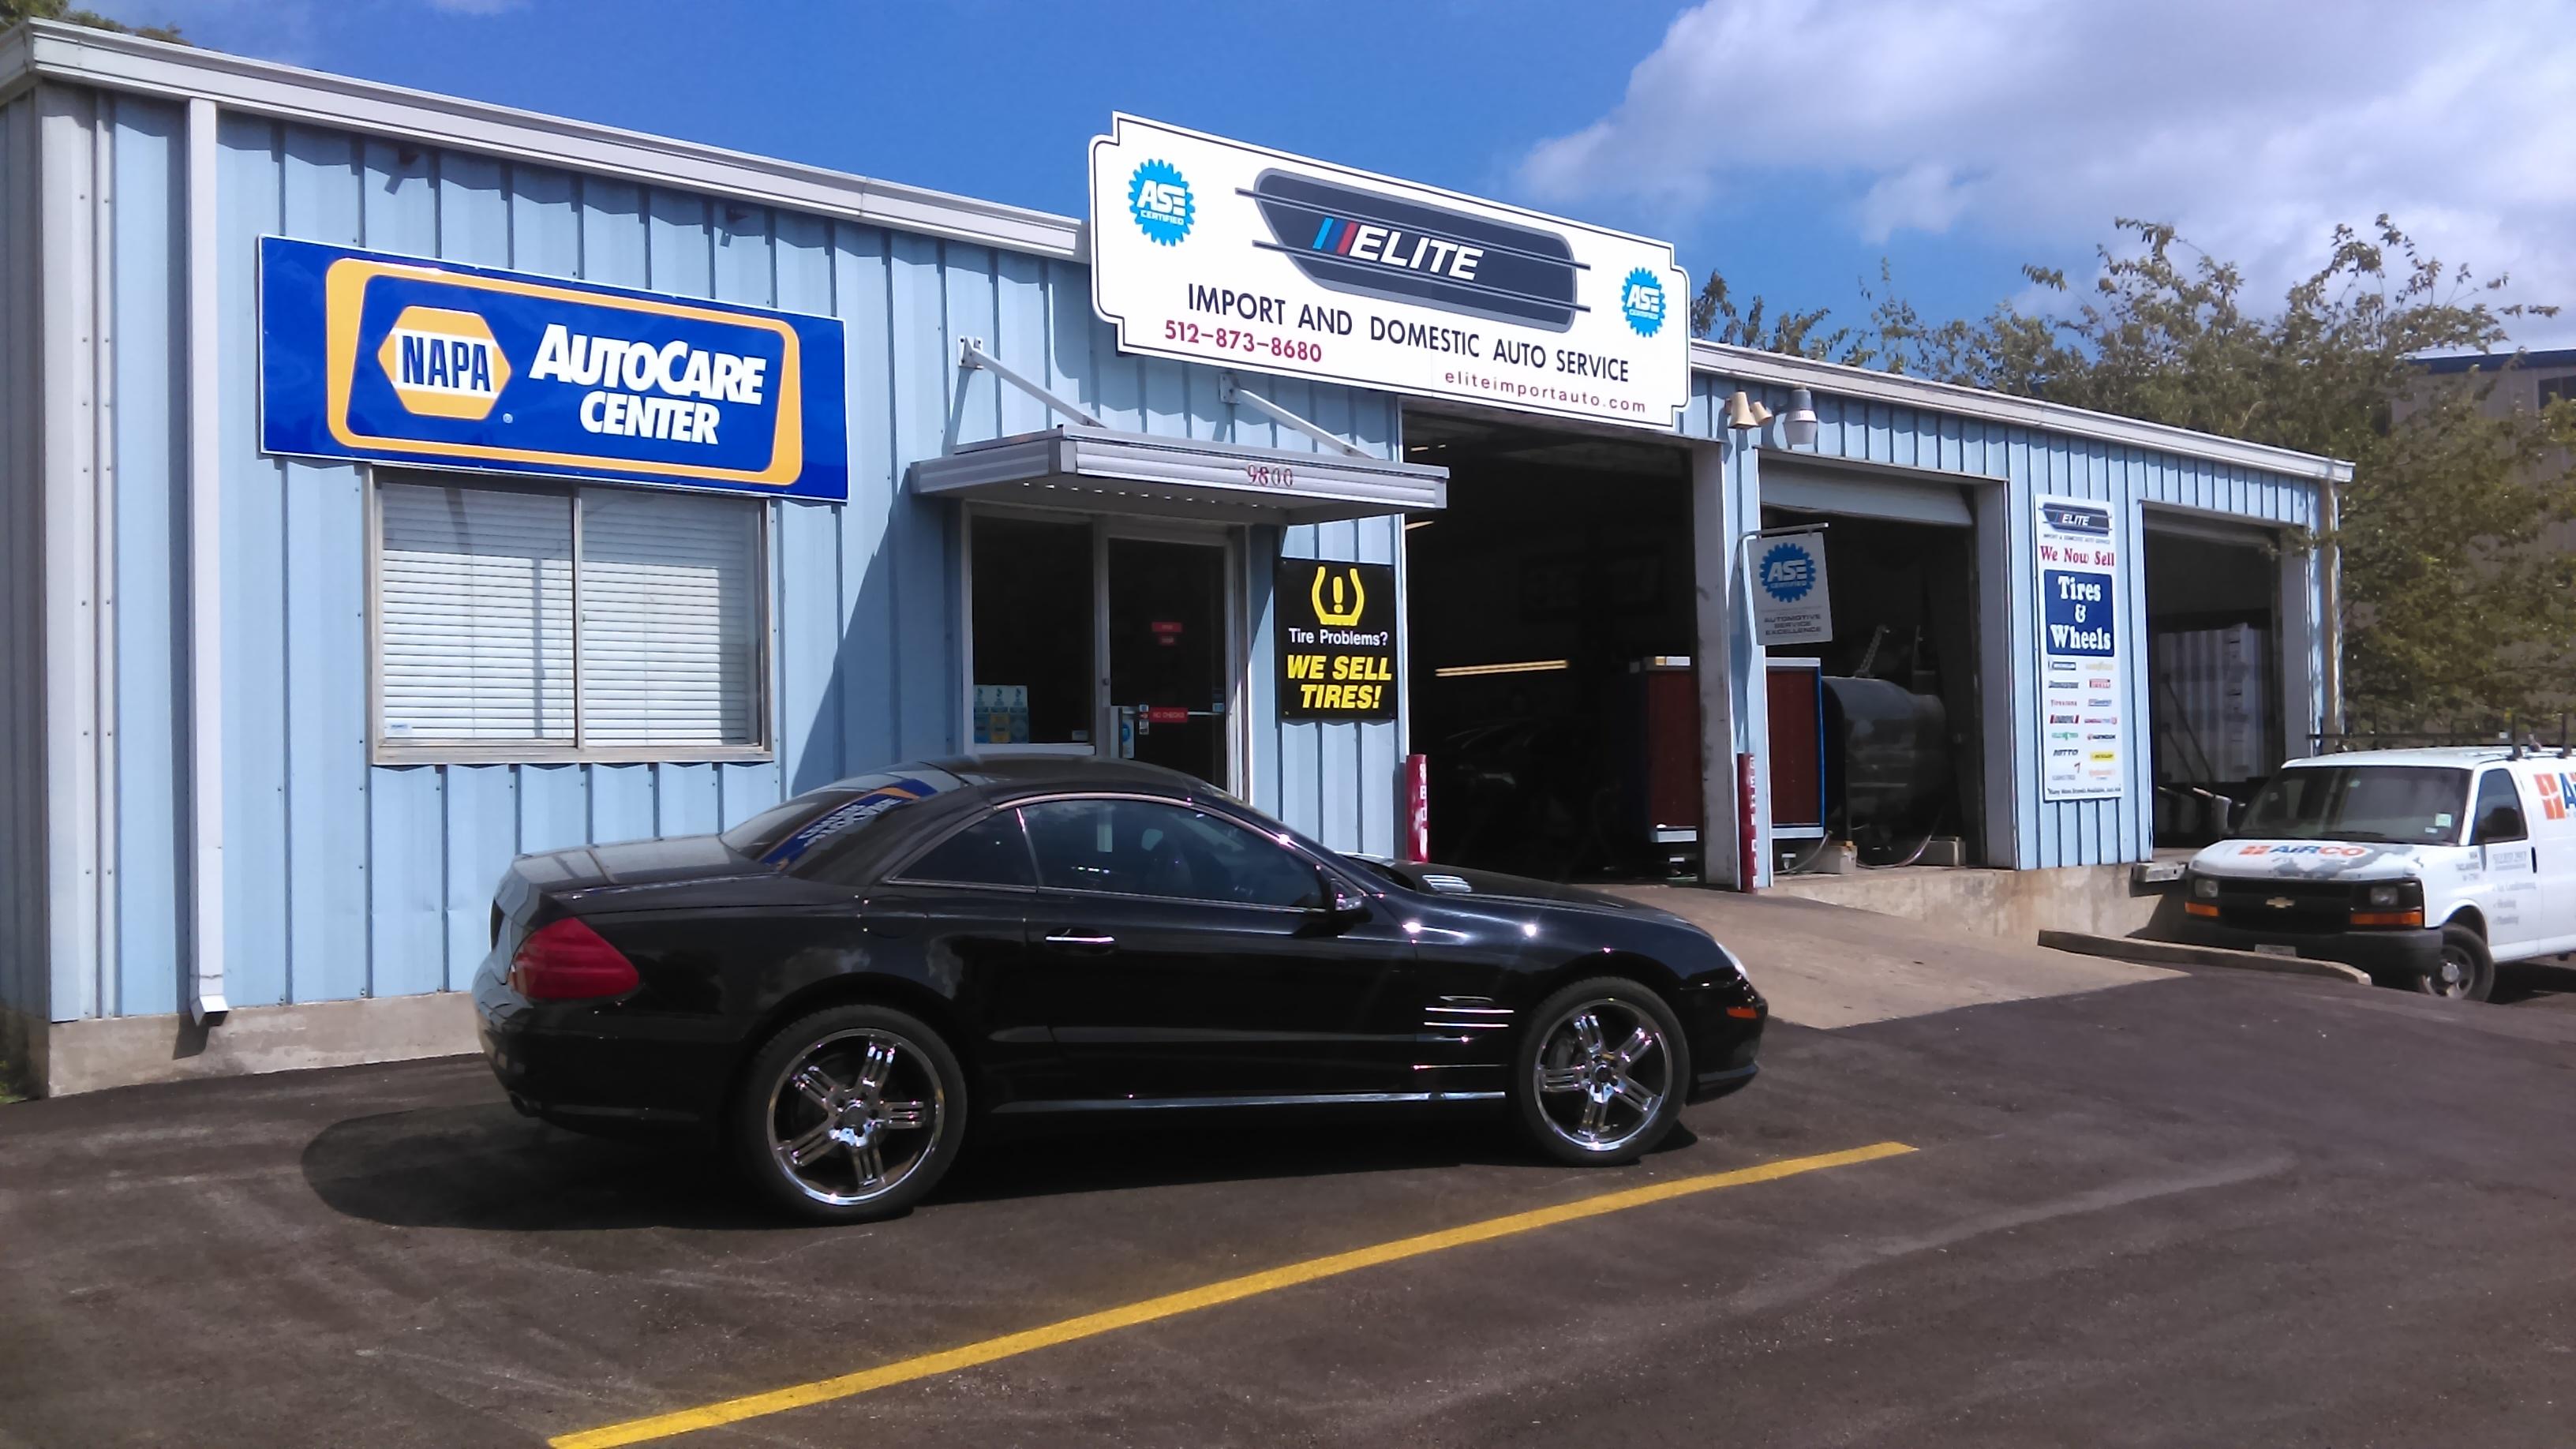 Los Angeles Lexus Service Coupons >> Elite Import Auto Service Coupons near me in Austin | 8coupons